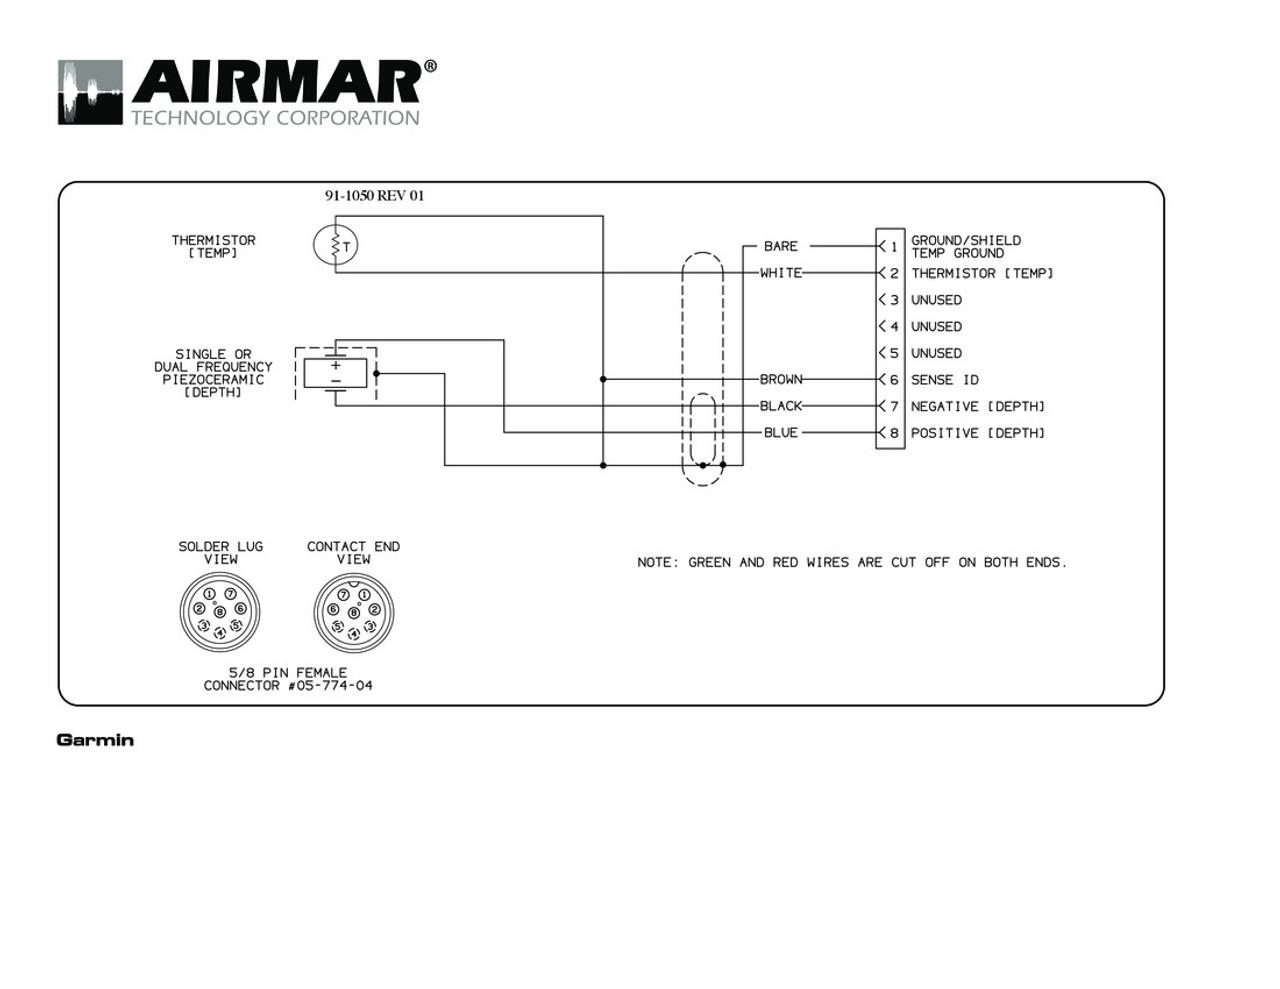 8 Pin Connector Wiring Diagram - 10.hyn.capecoral-bootsvermietung.de